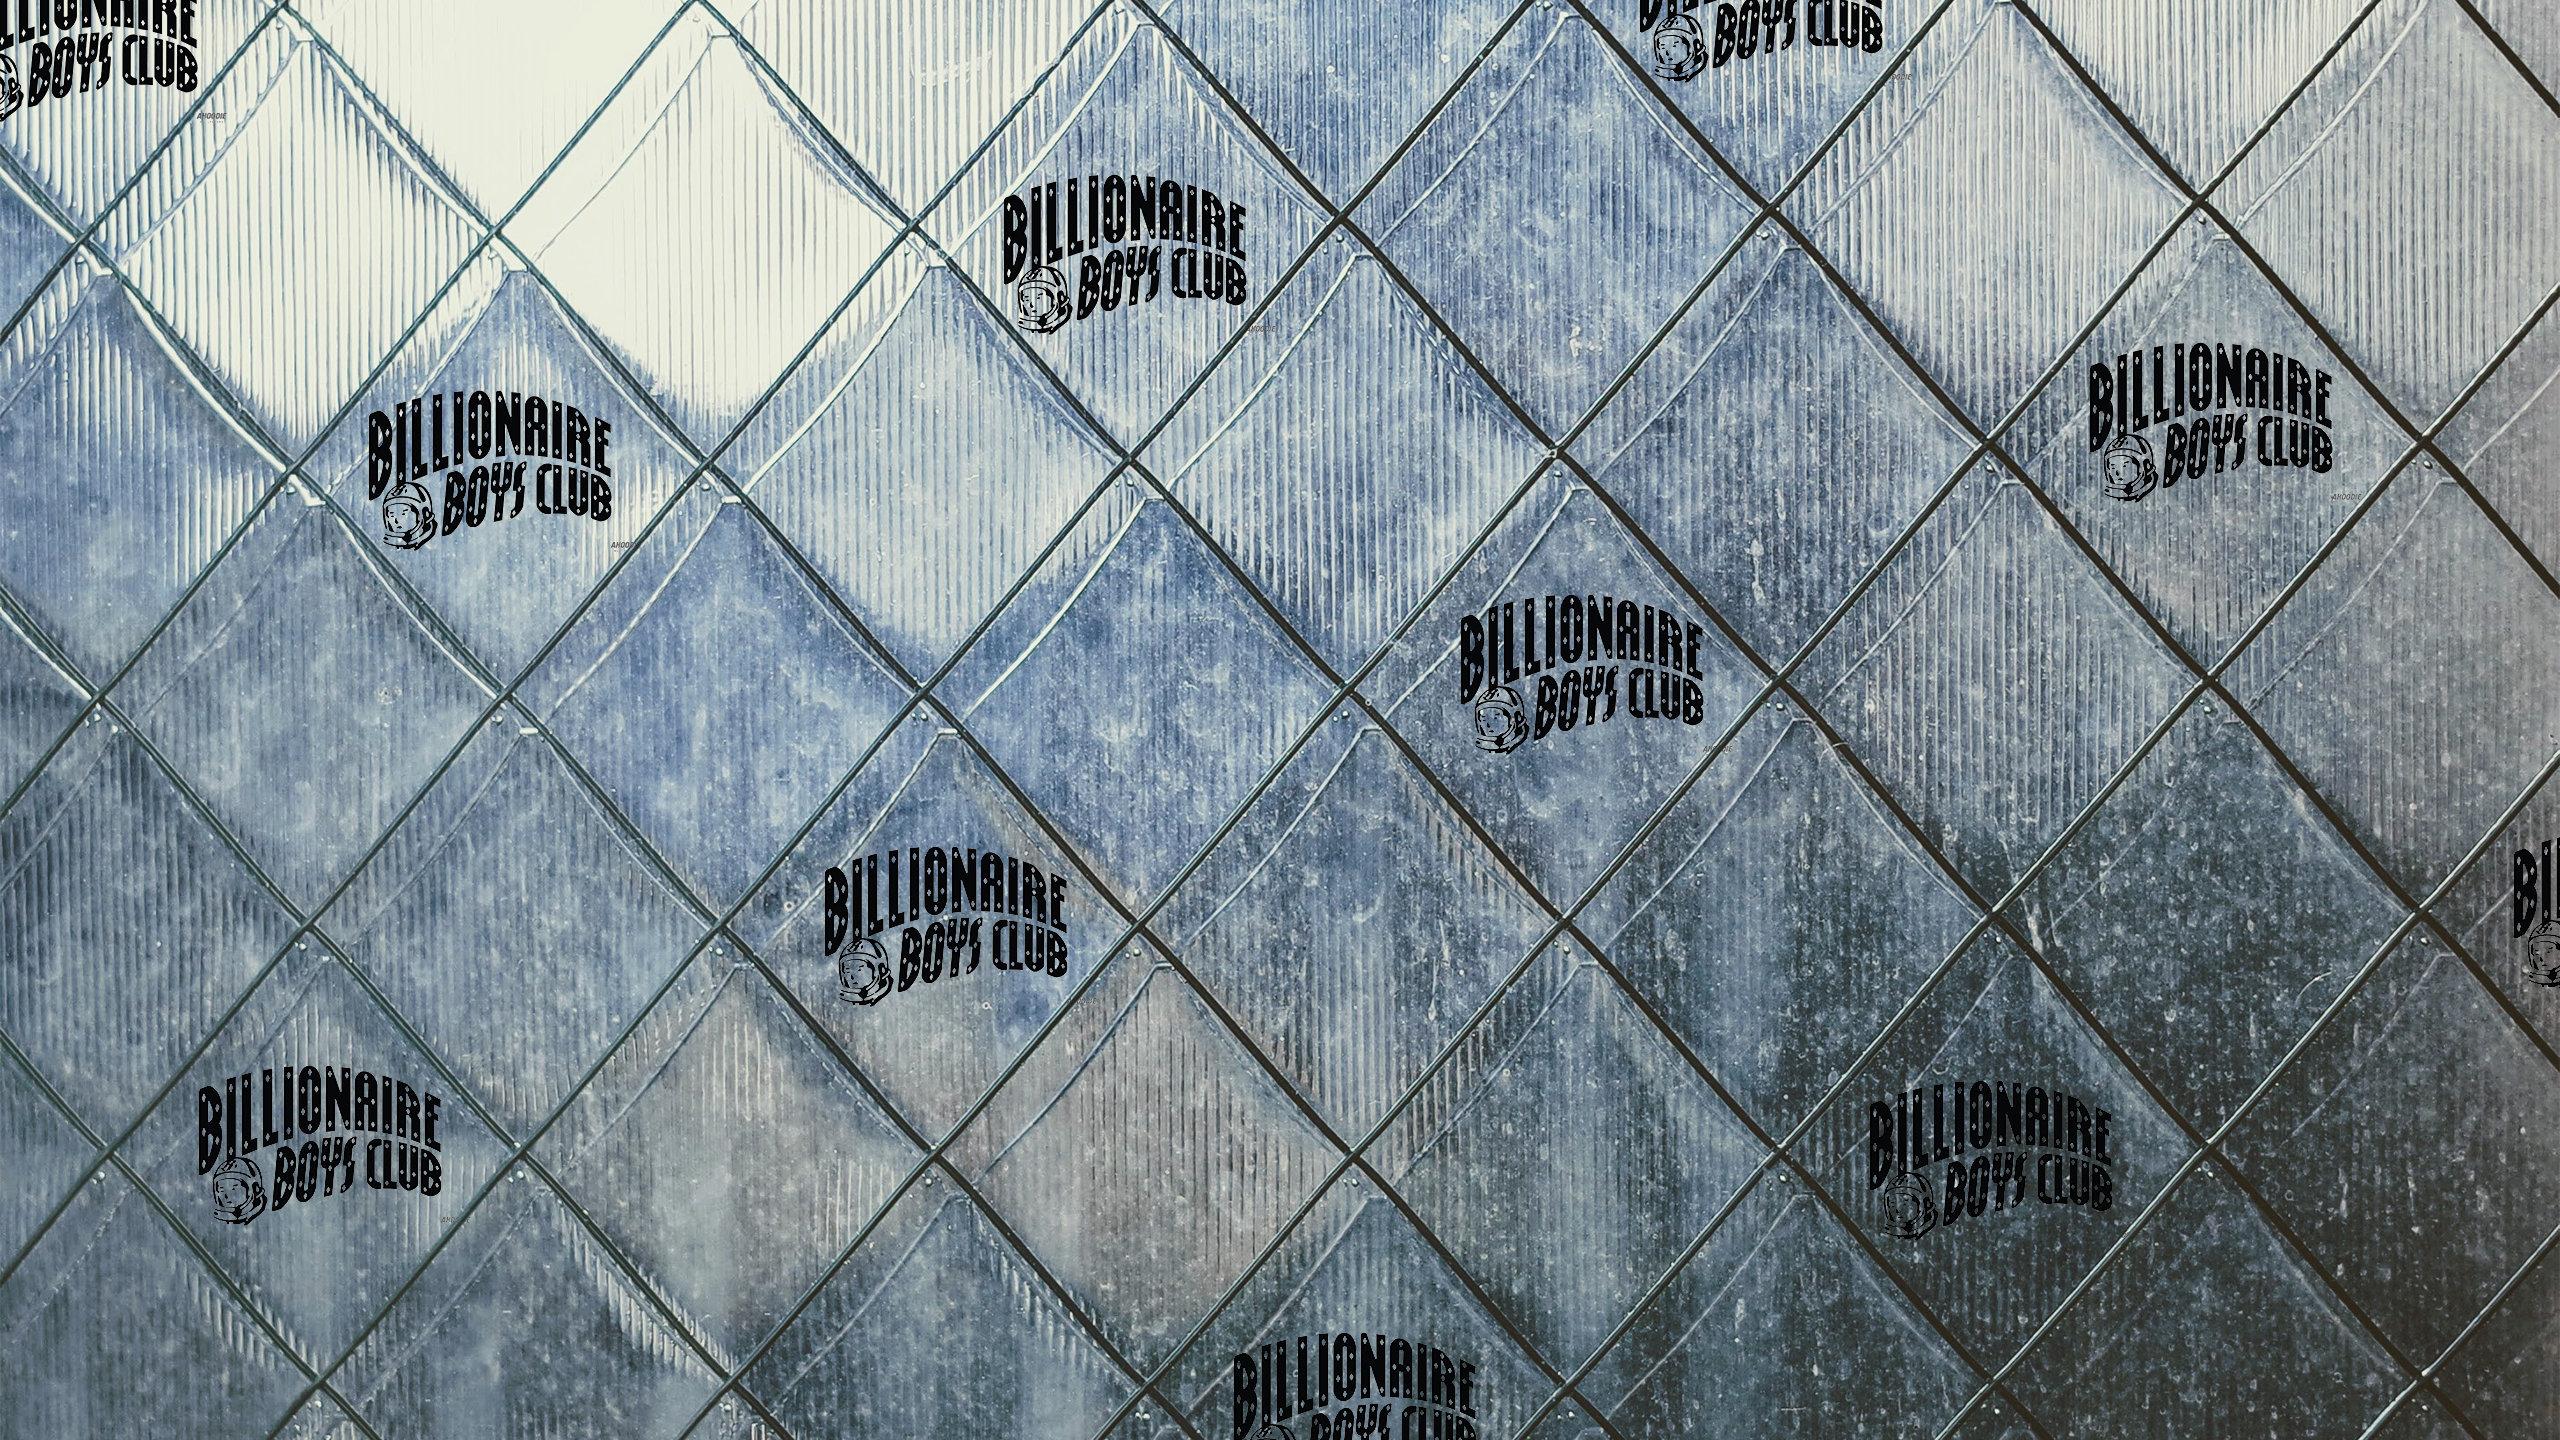 Billionaire Boys Club Wallpaper Copemlegit